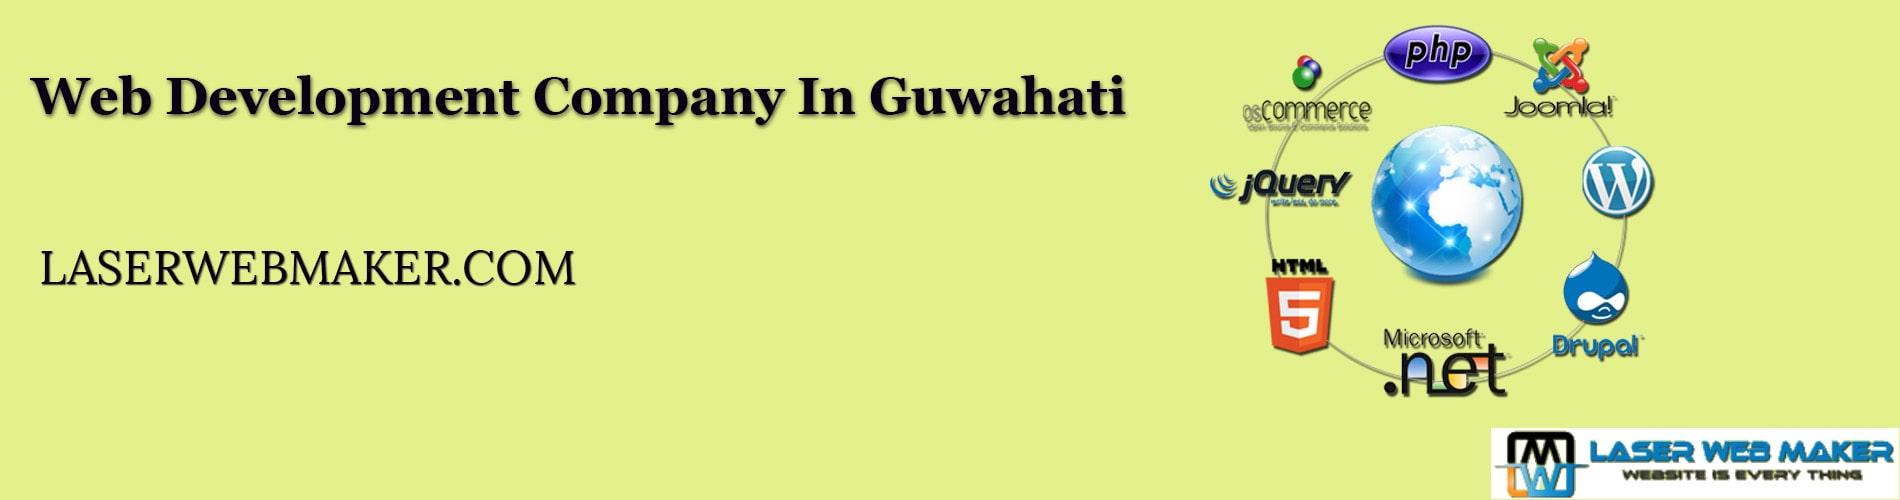 Top Web Development Company In Guwahati